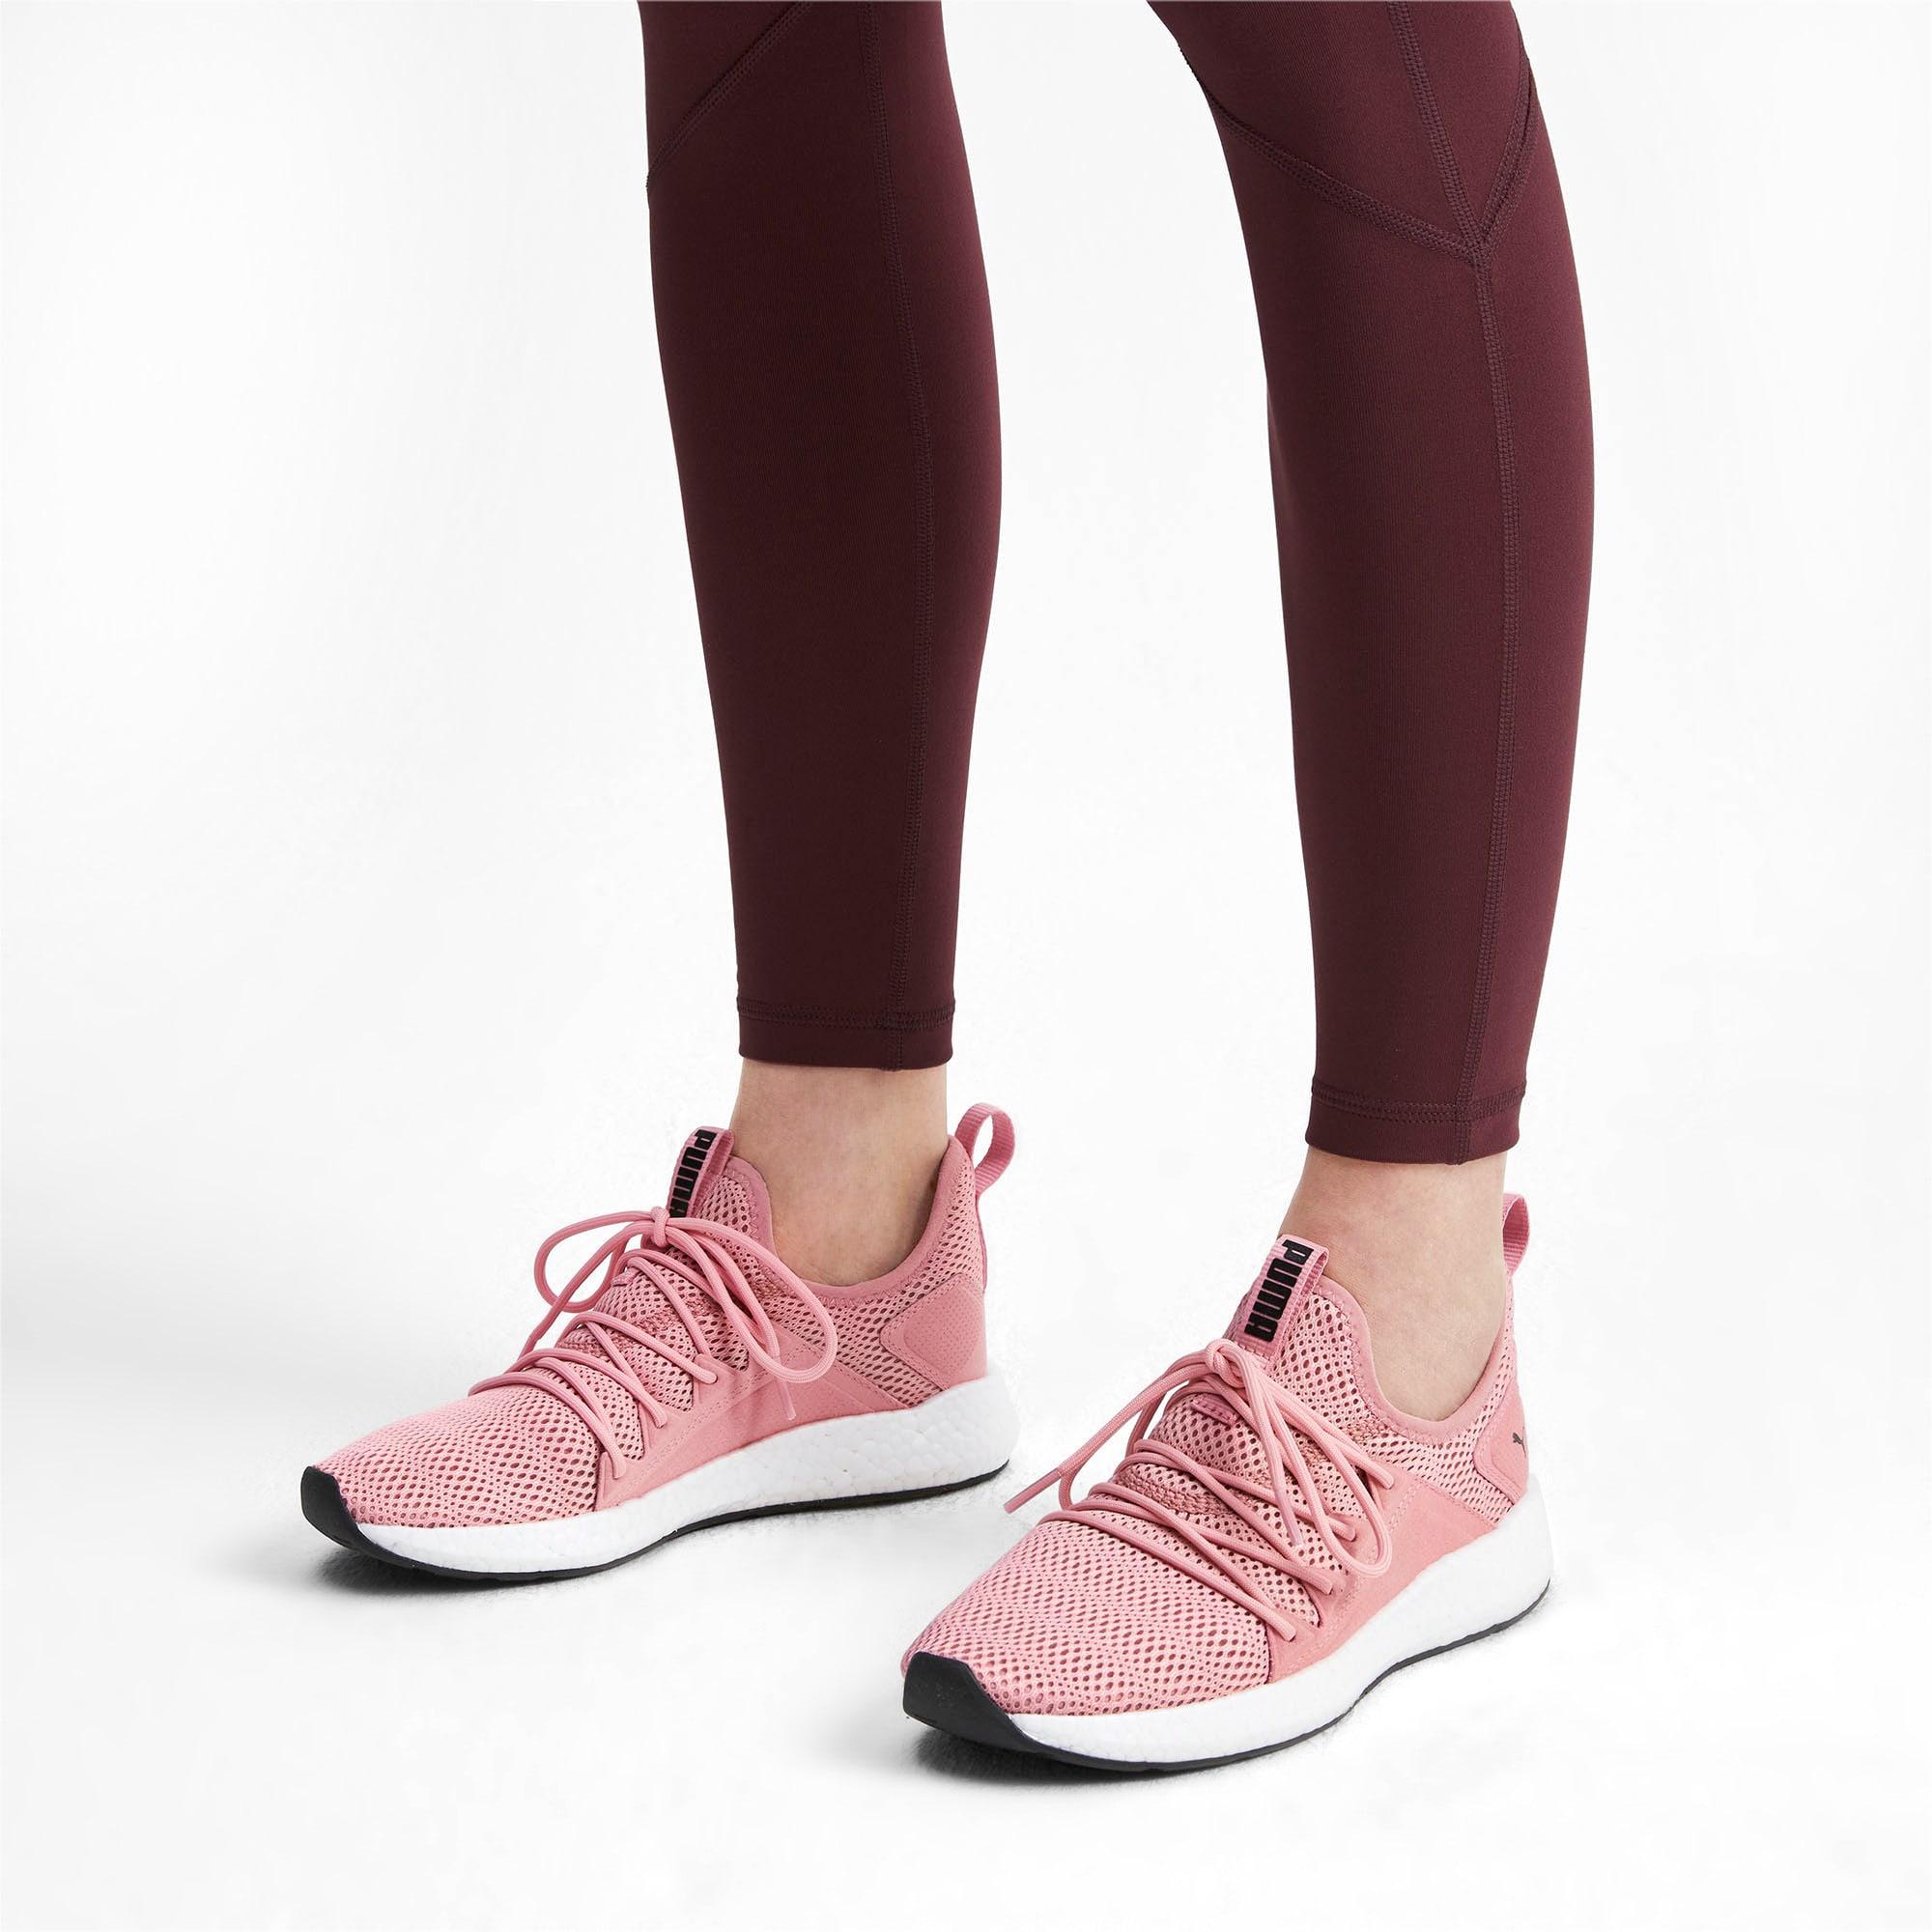 Thumbnail 2 of NRGY Neko Shift Women's Running Shoes, Bridal Rose-Puma White, medium